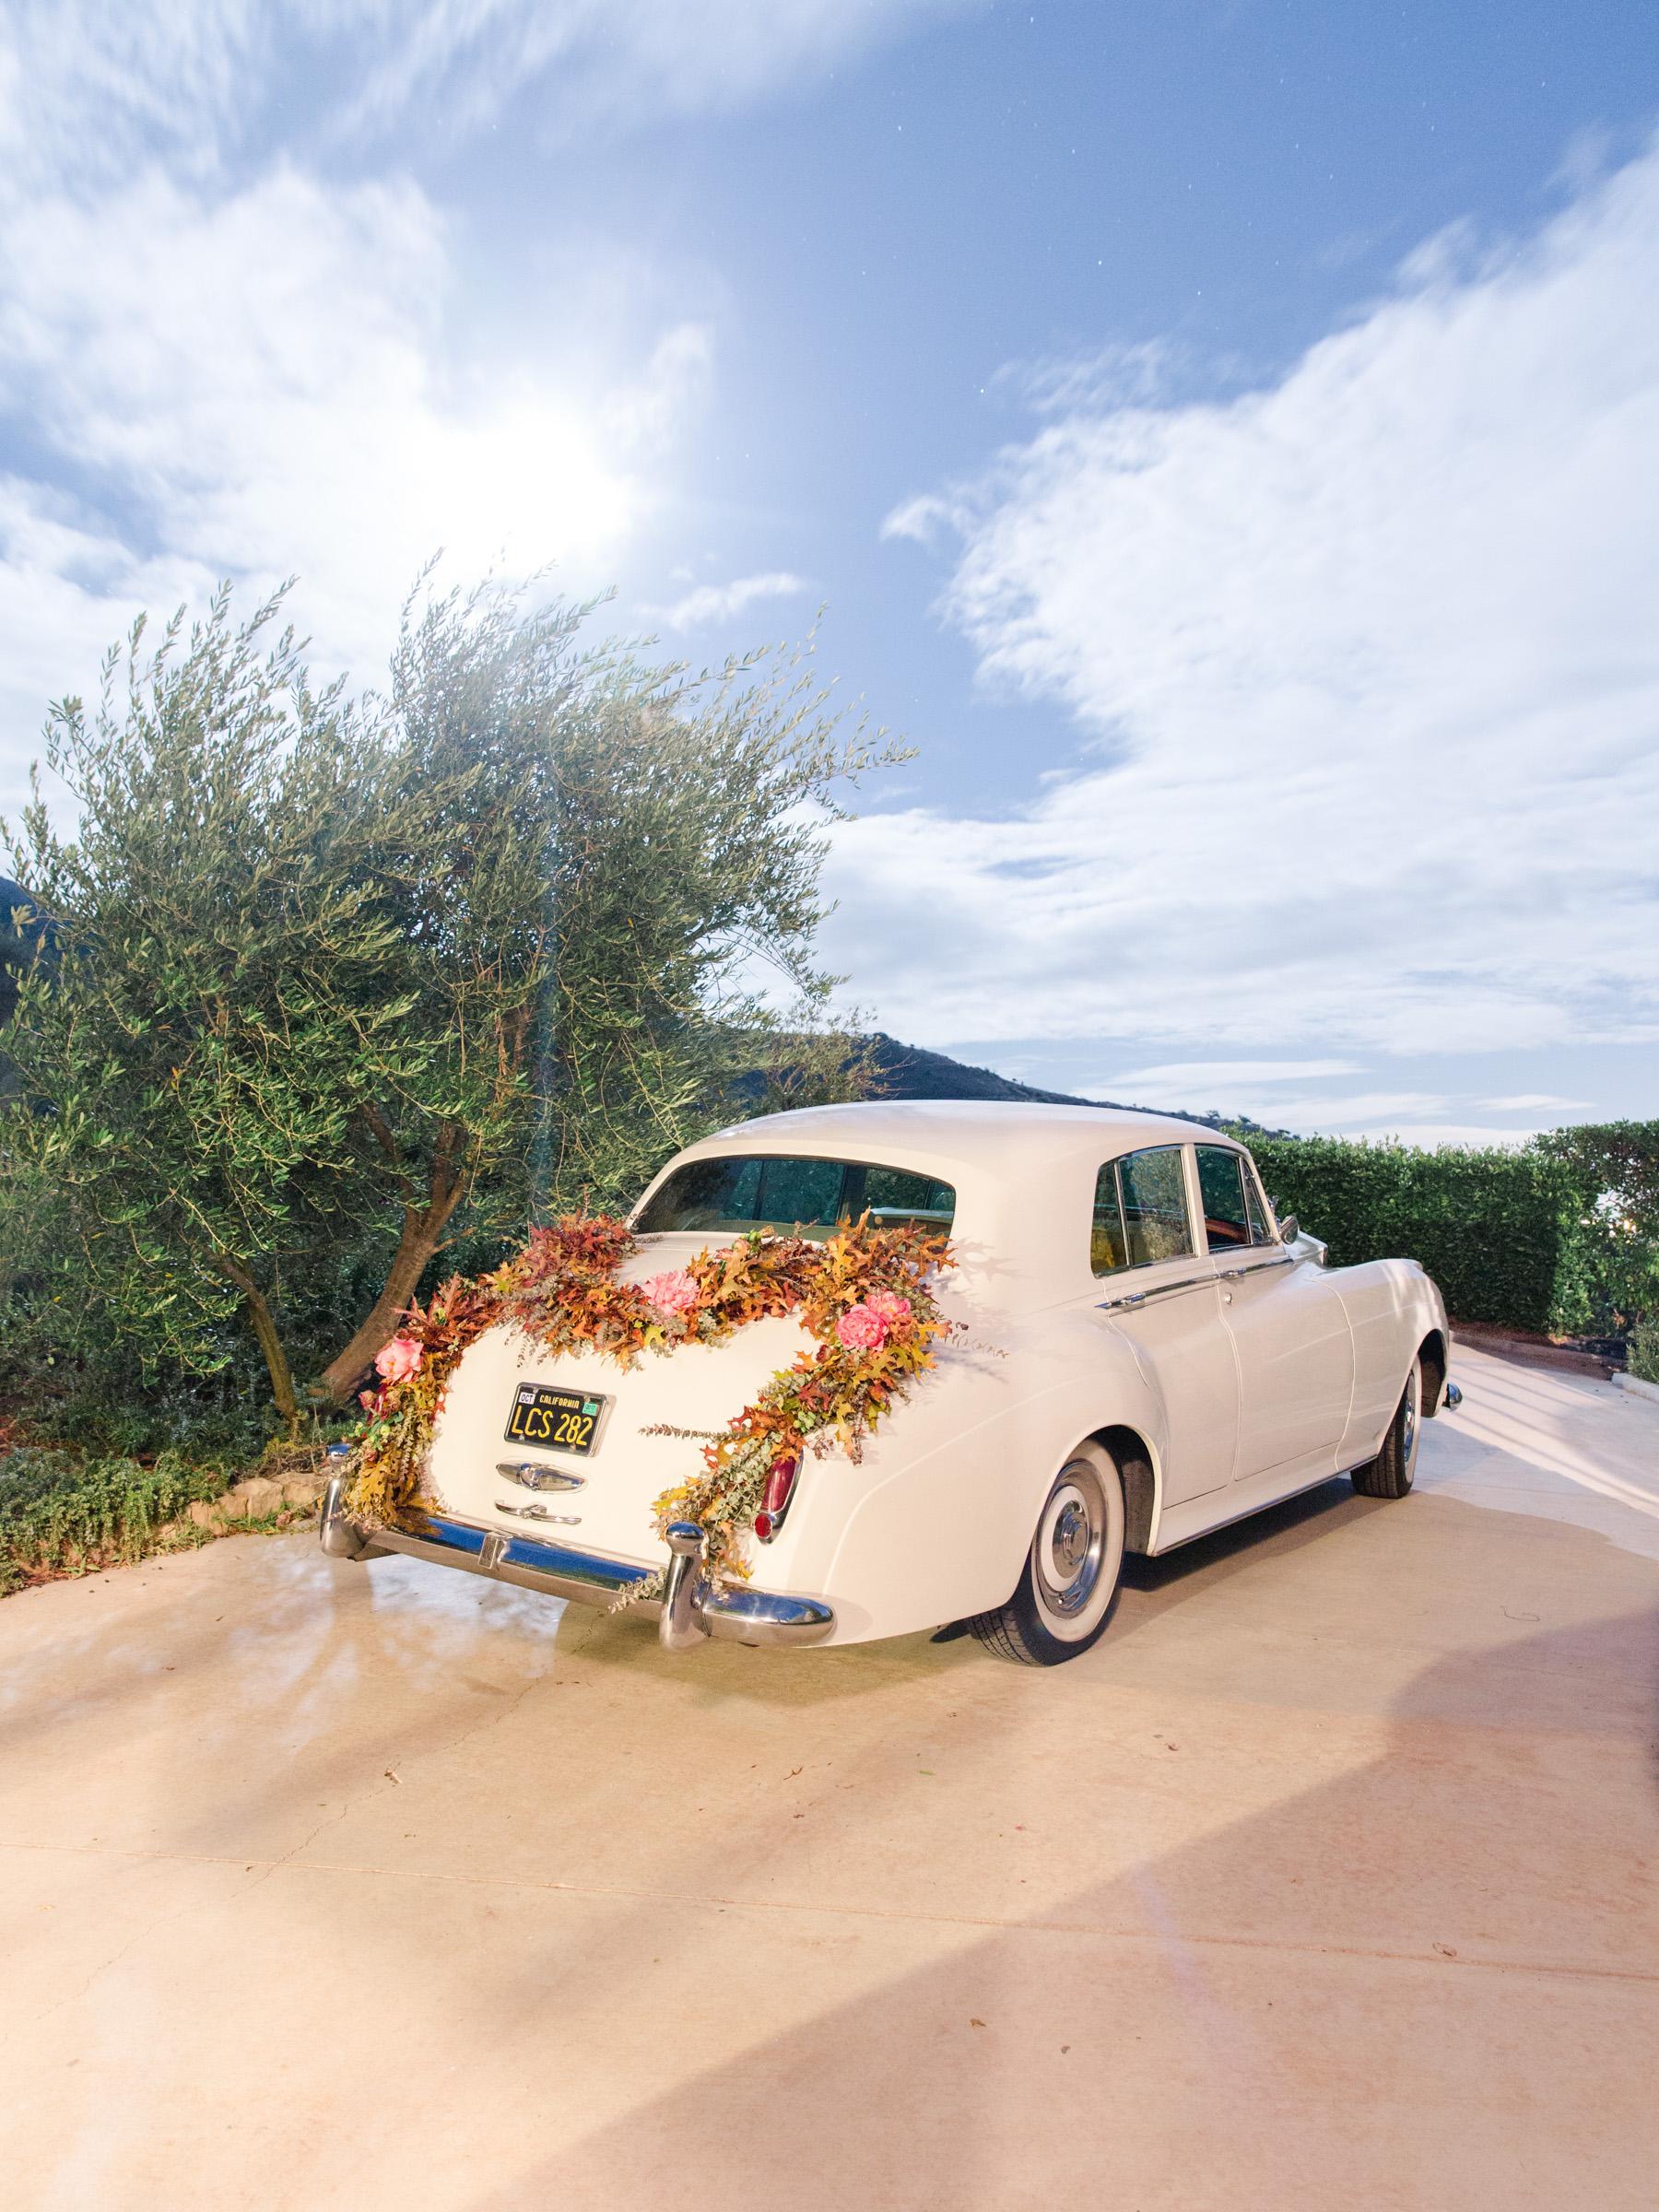 kathryn ian wedding getaway car